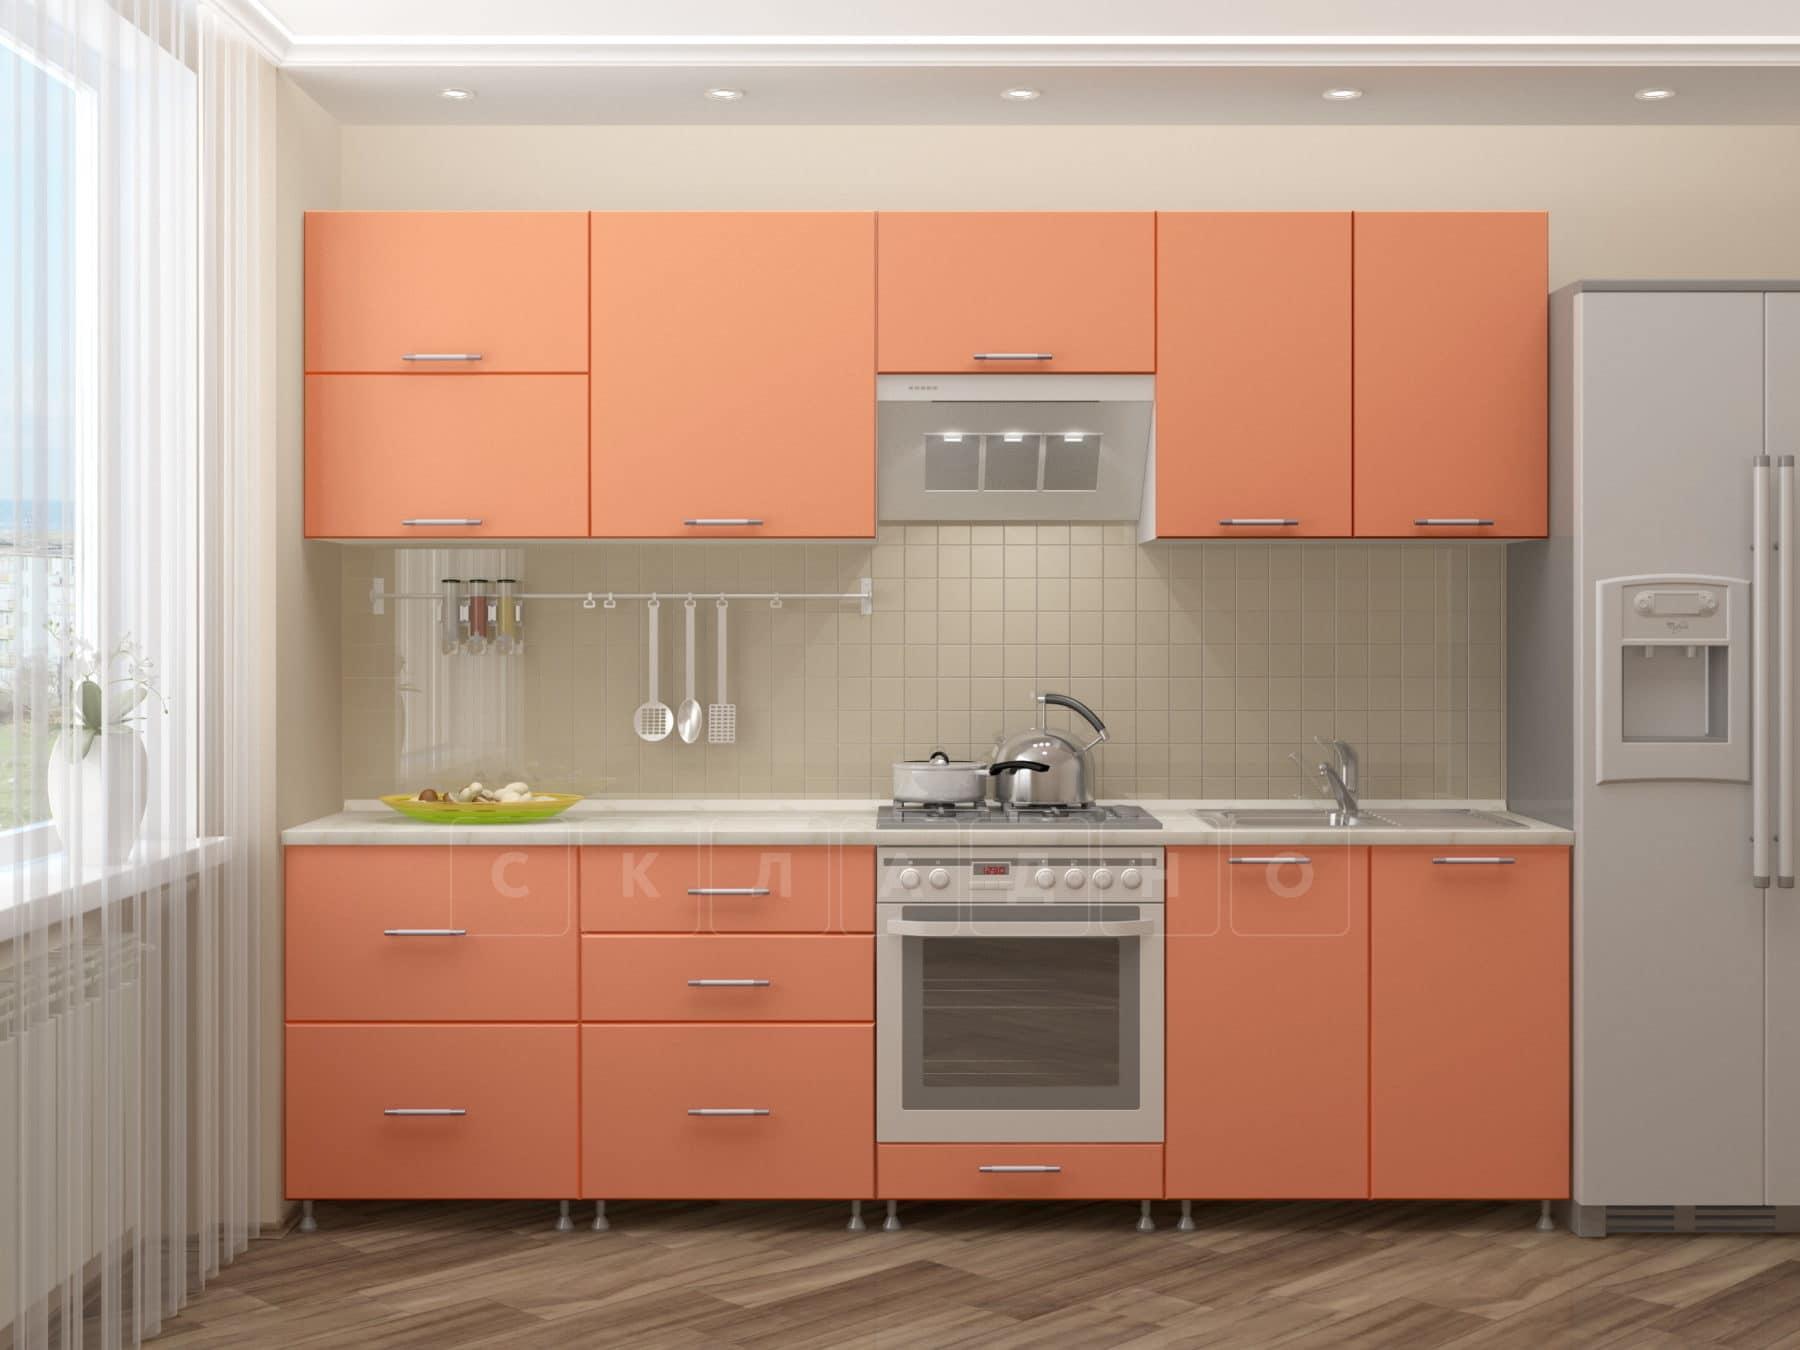 Кухонный гарнитур Шарлотта 2,6 м белый фото 2 | интернет-магазин Складно